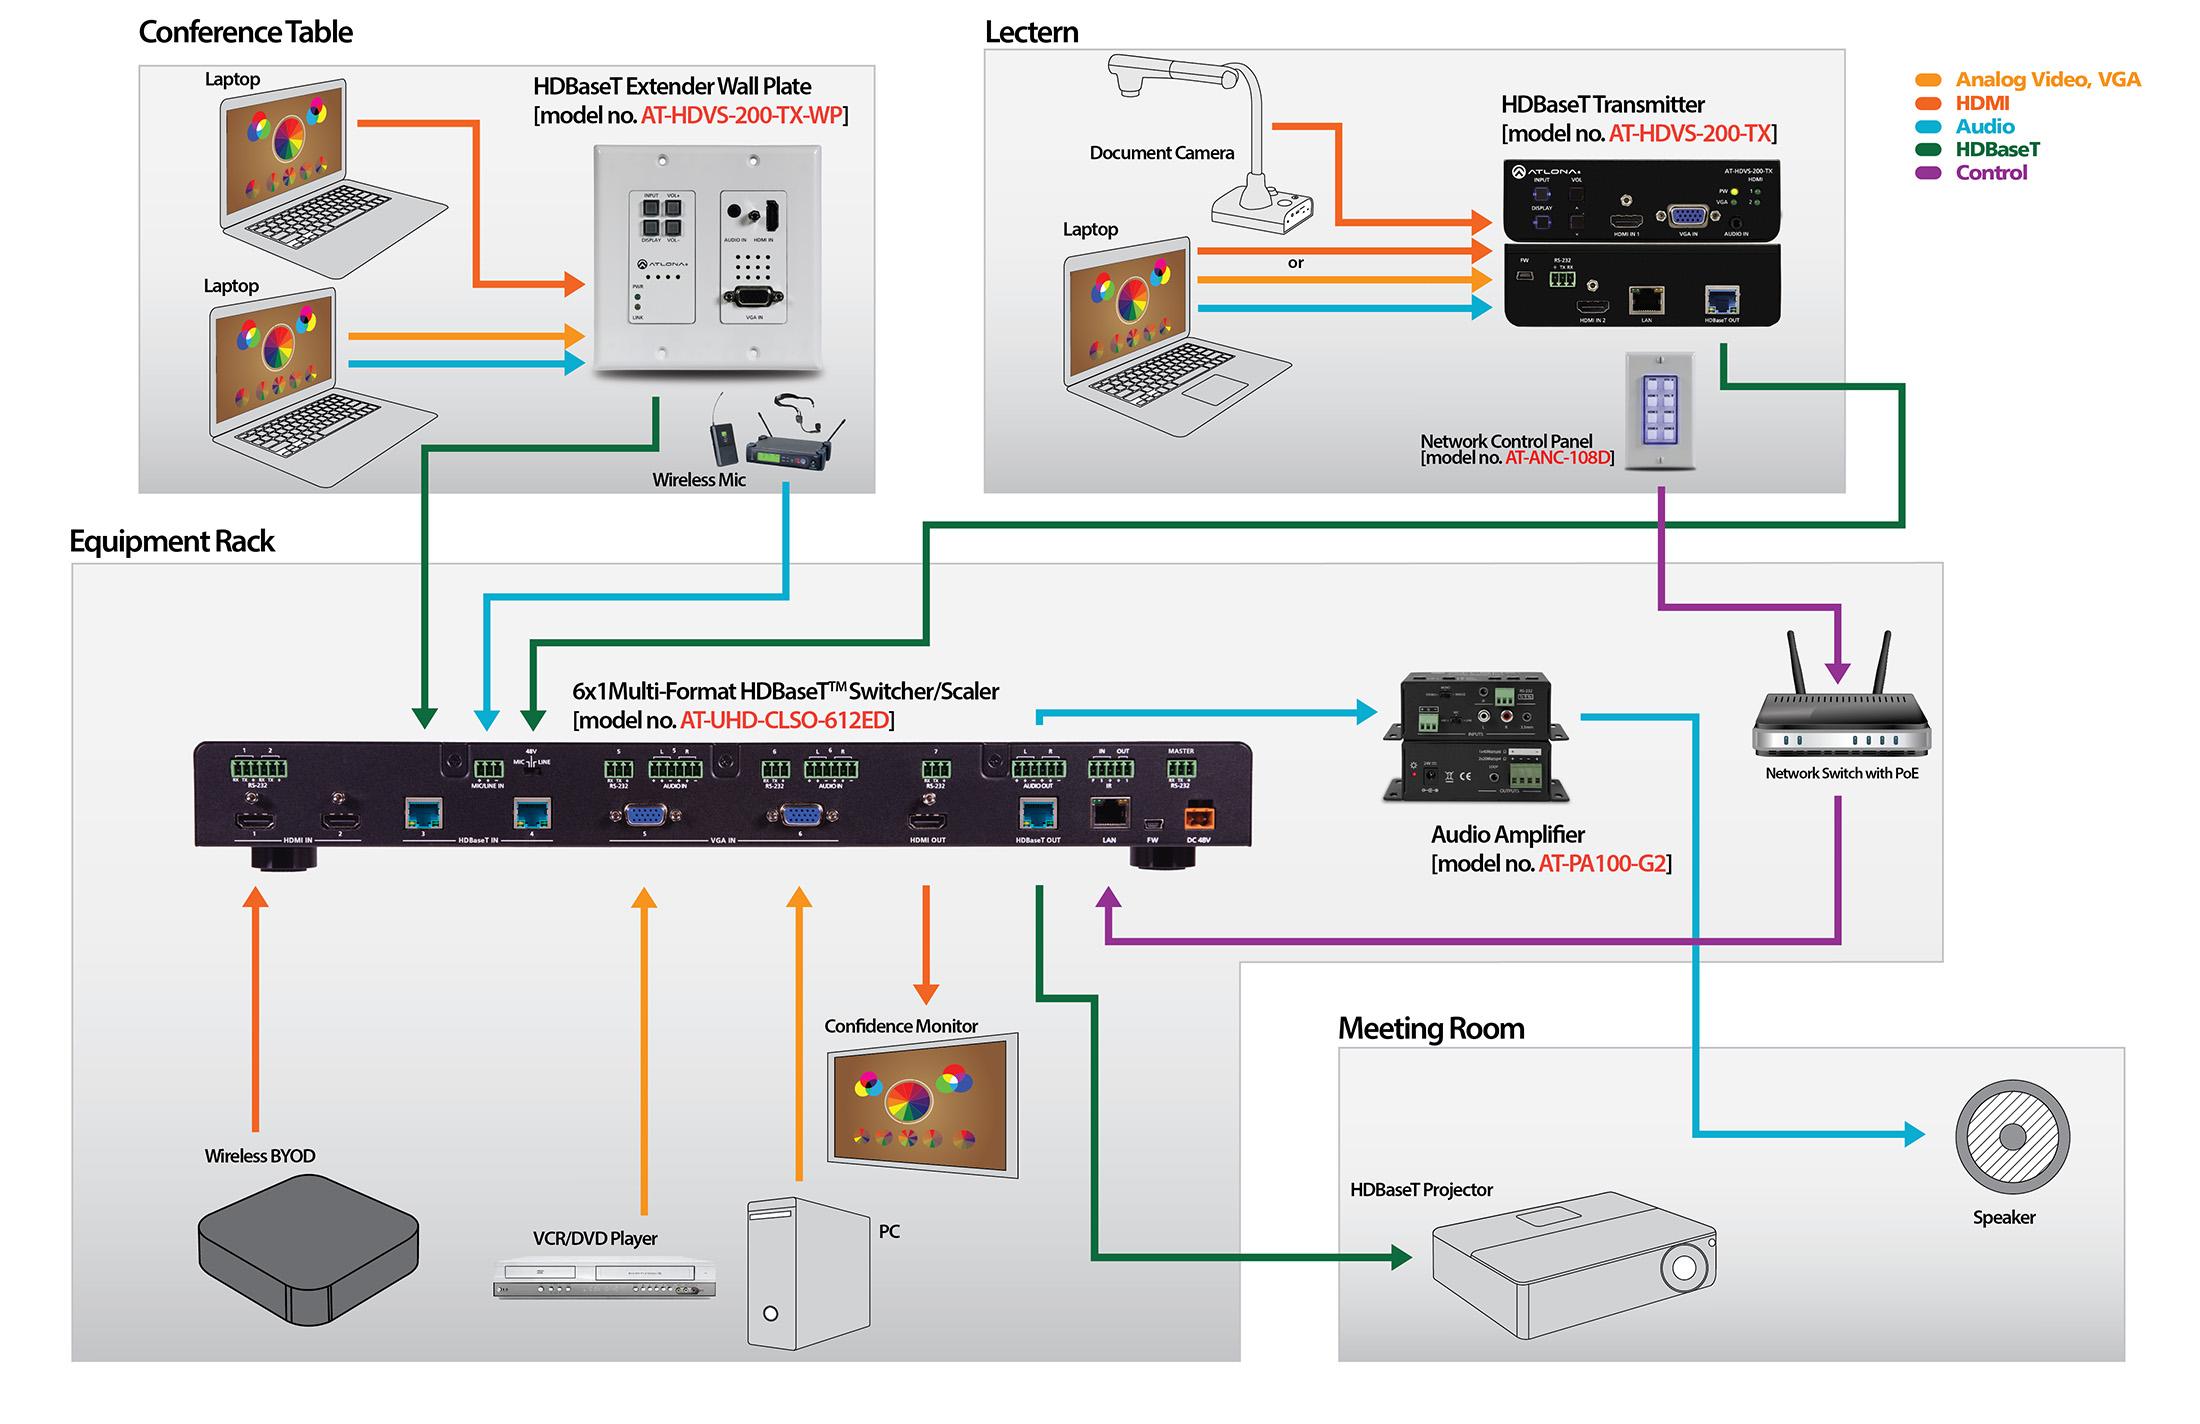 Amx Wiring Diagram Conference Room Atlona 174 Av Solutions Commercial